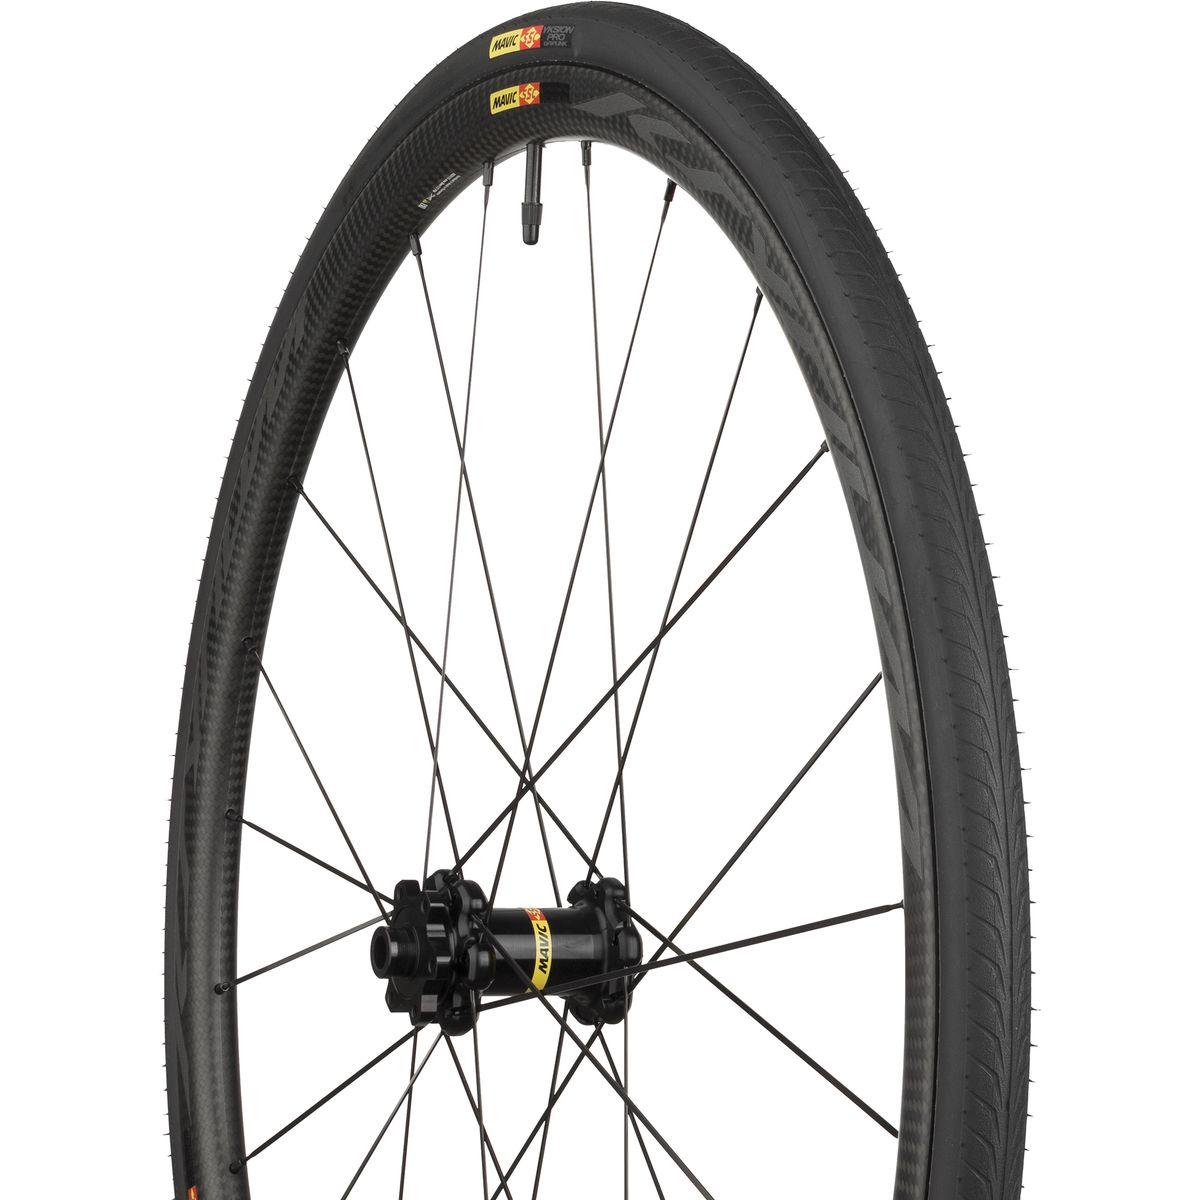 Mavic Ksyrium Pro Carbon SL Disc Wheelset Clincher Black Shimano SRAM 11-Speed